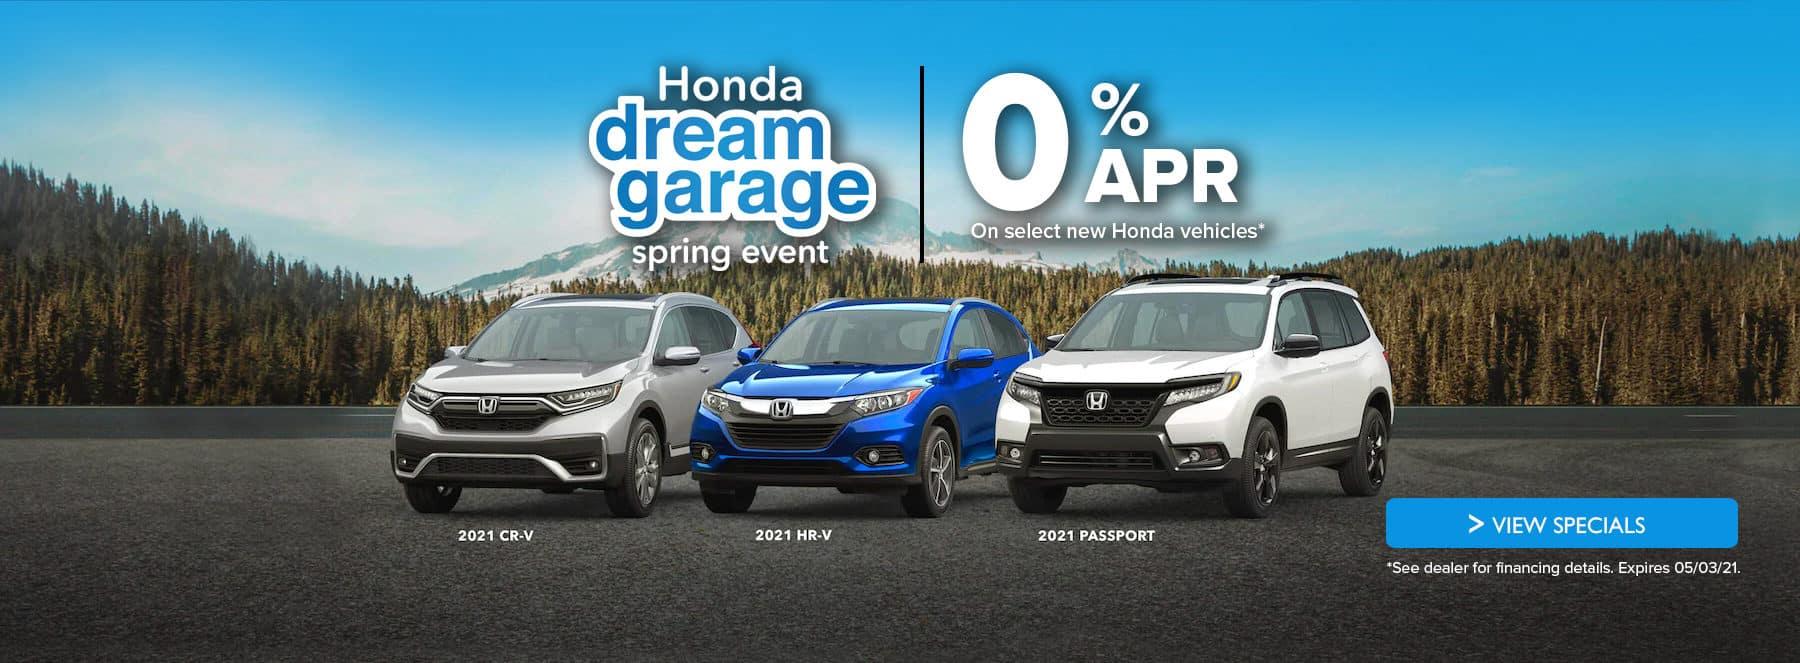 2021 Honda 0% APR Dream Garage